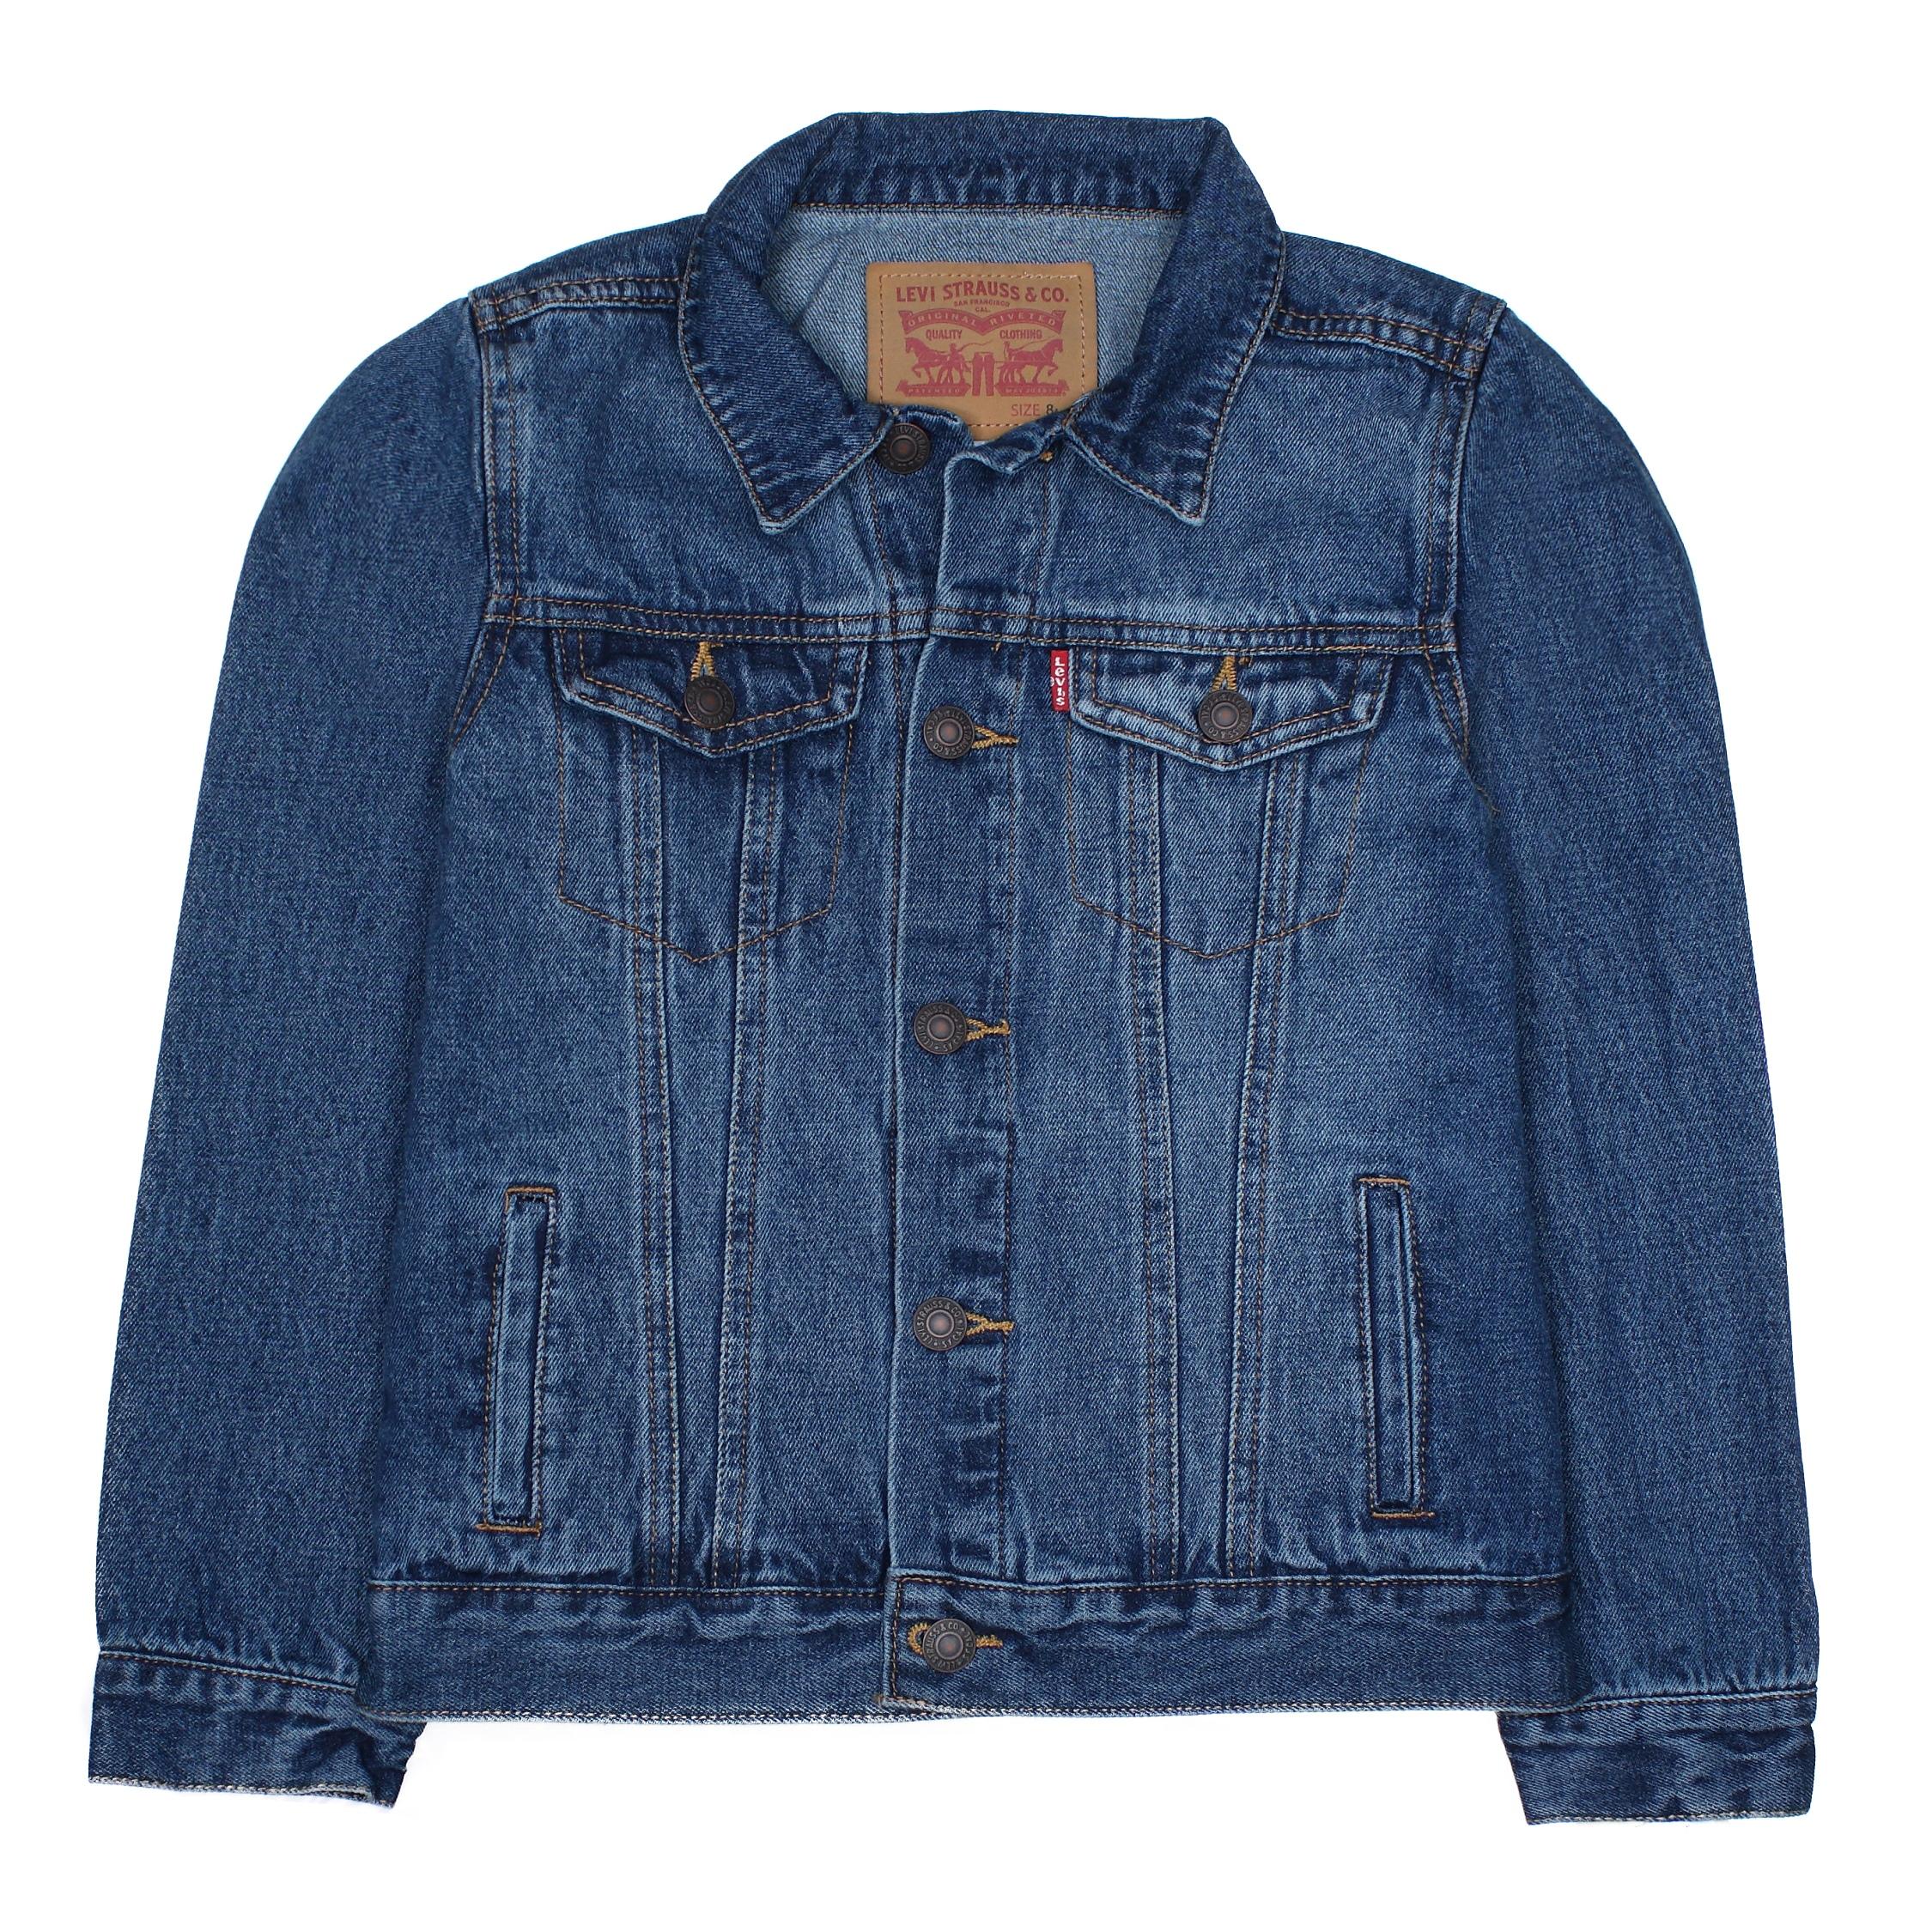 https://www.leadermode.com/184937/levi-s-kids-2058-m8x-bleu-jeans.jpg